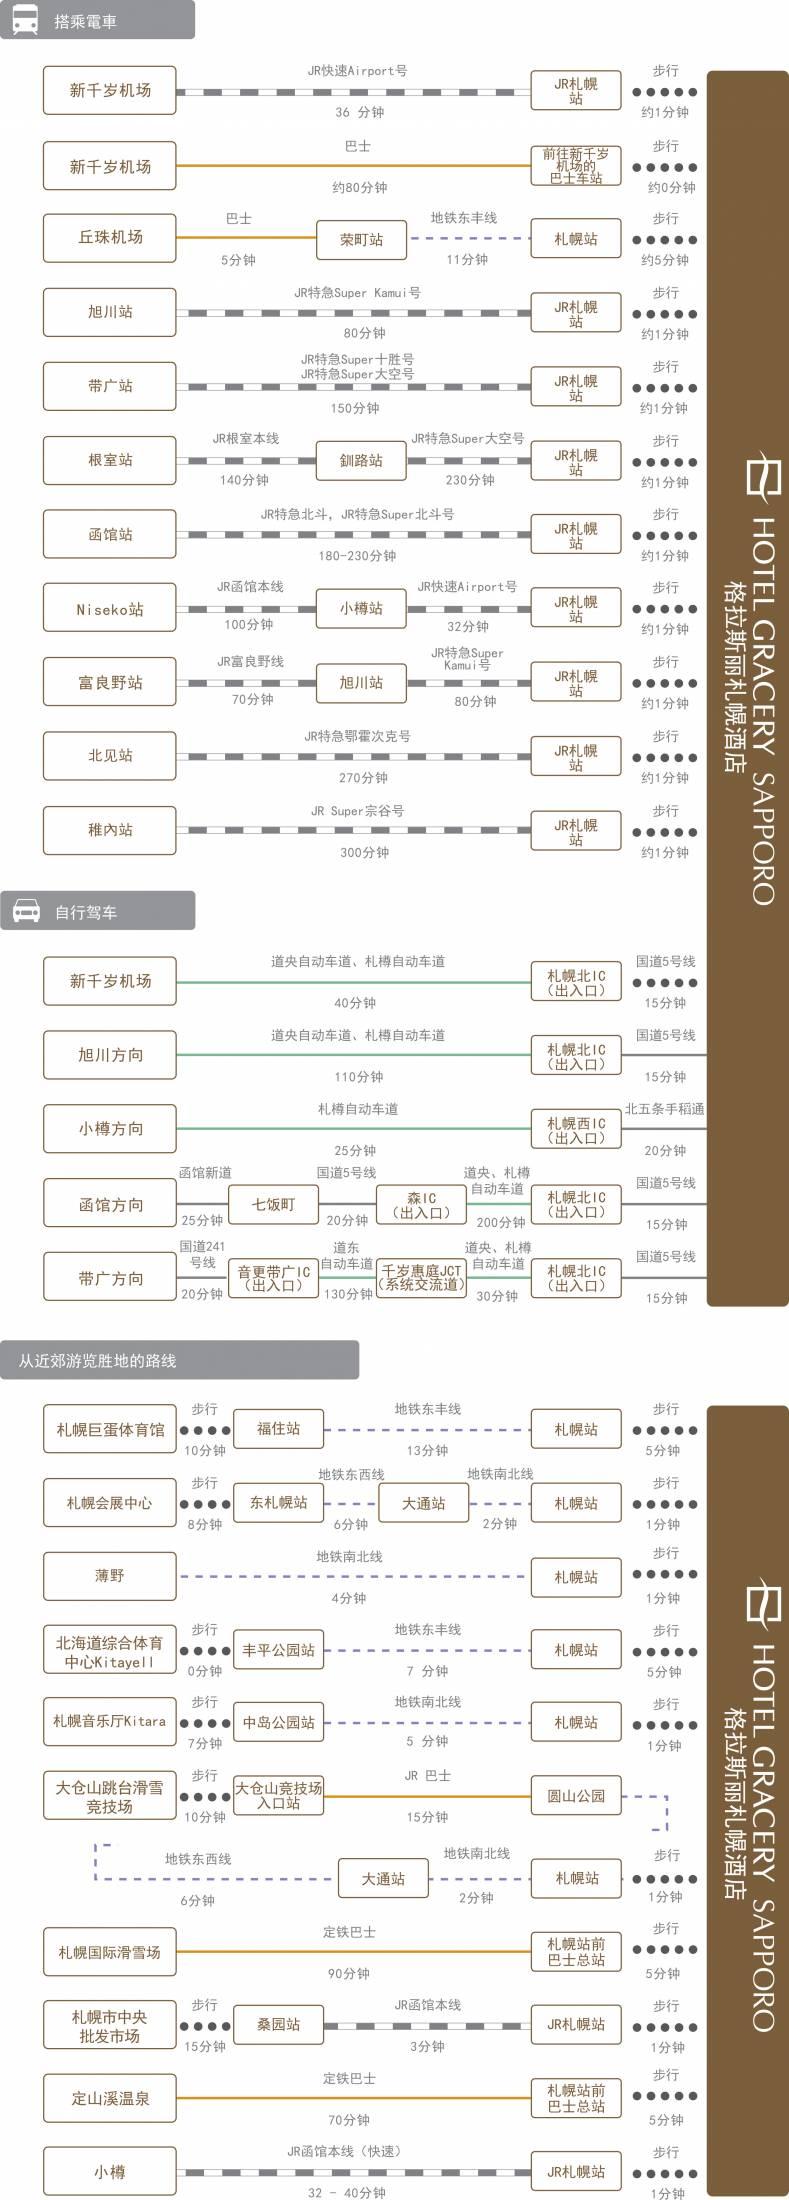 chart_zh-cn_sapporo_g